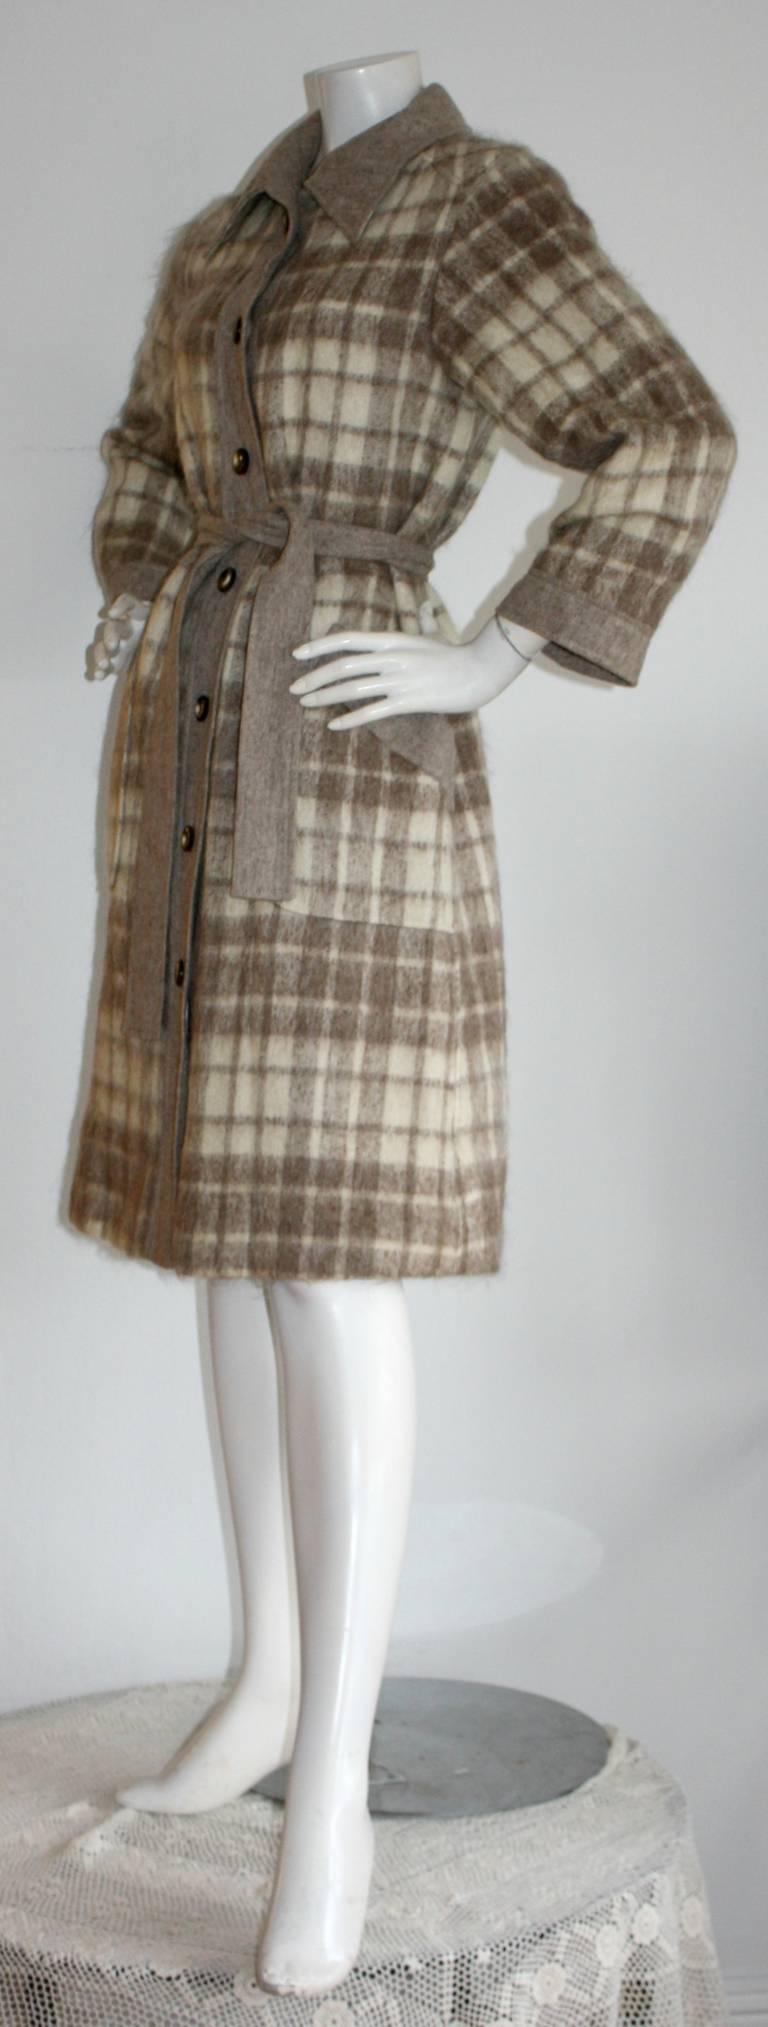 Vintage Pierre Cardin Heathered Camel Tartan Plaid Belted Wool Coat 6